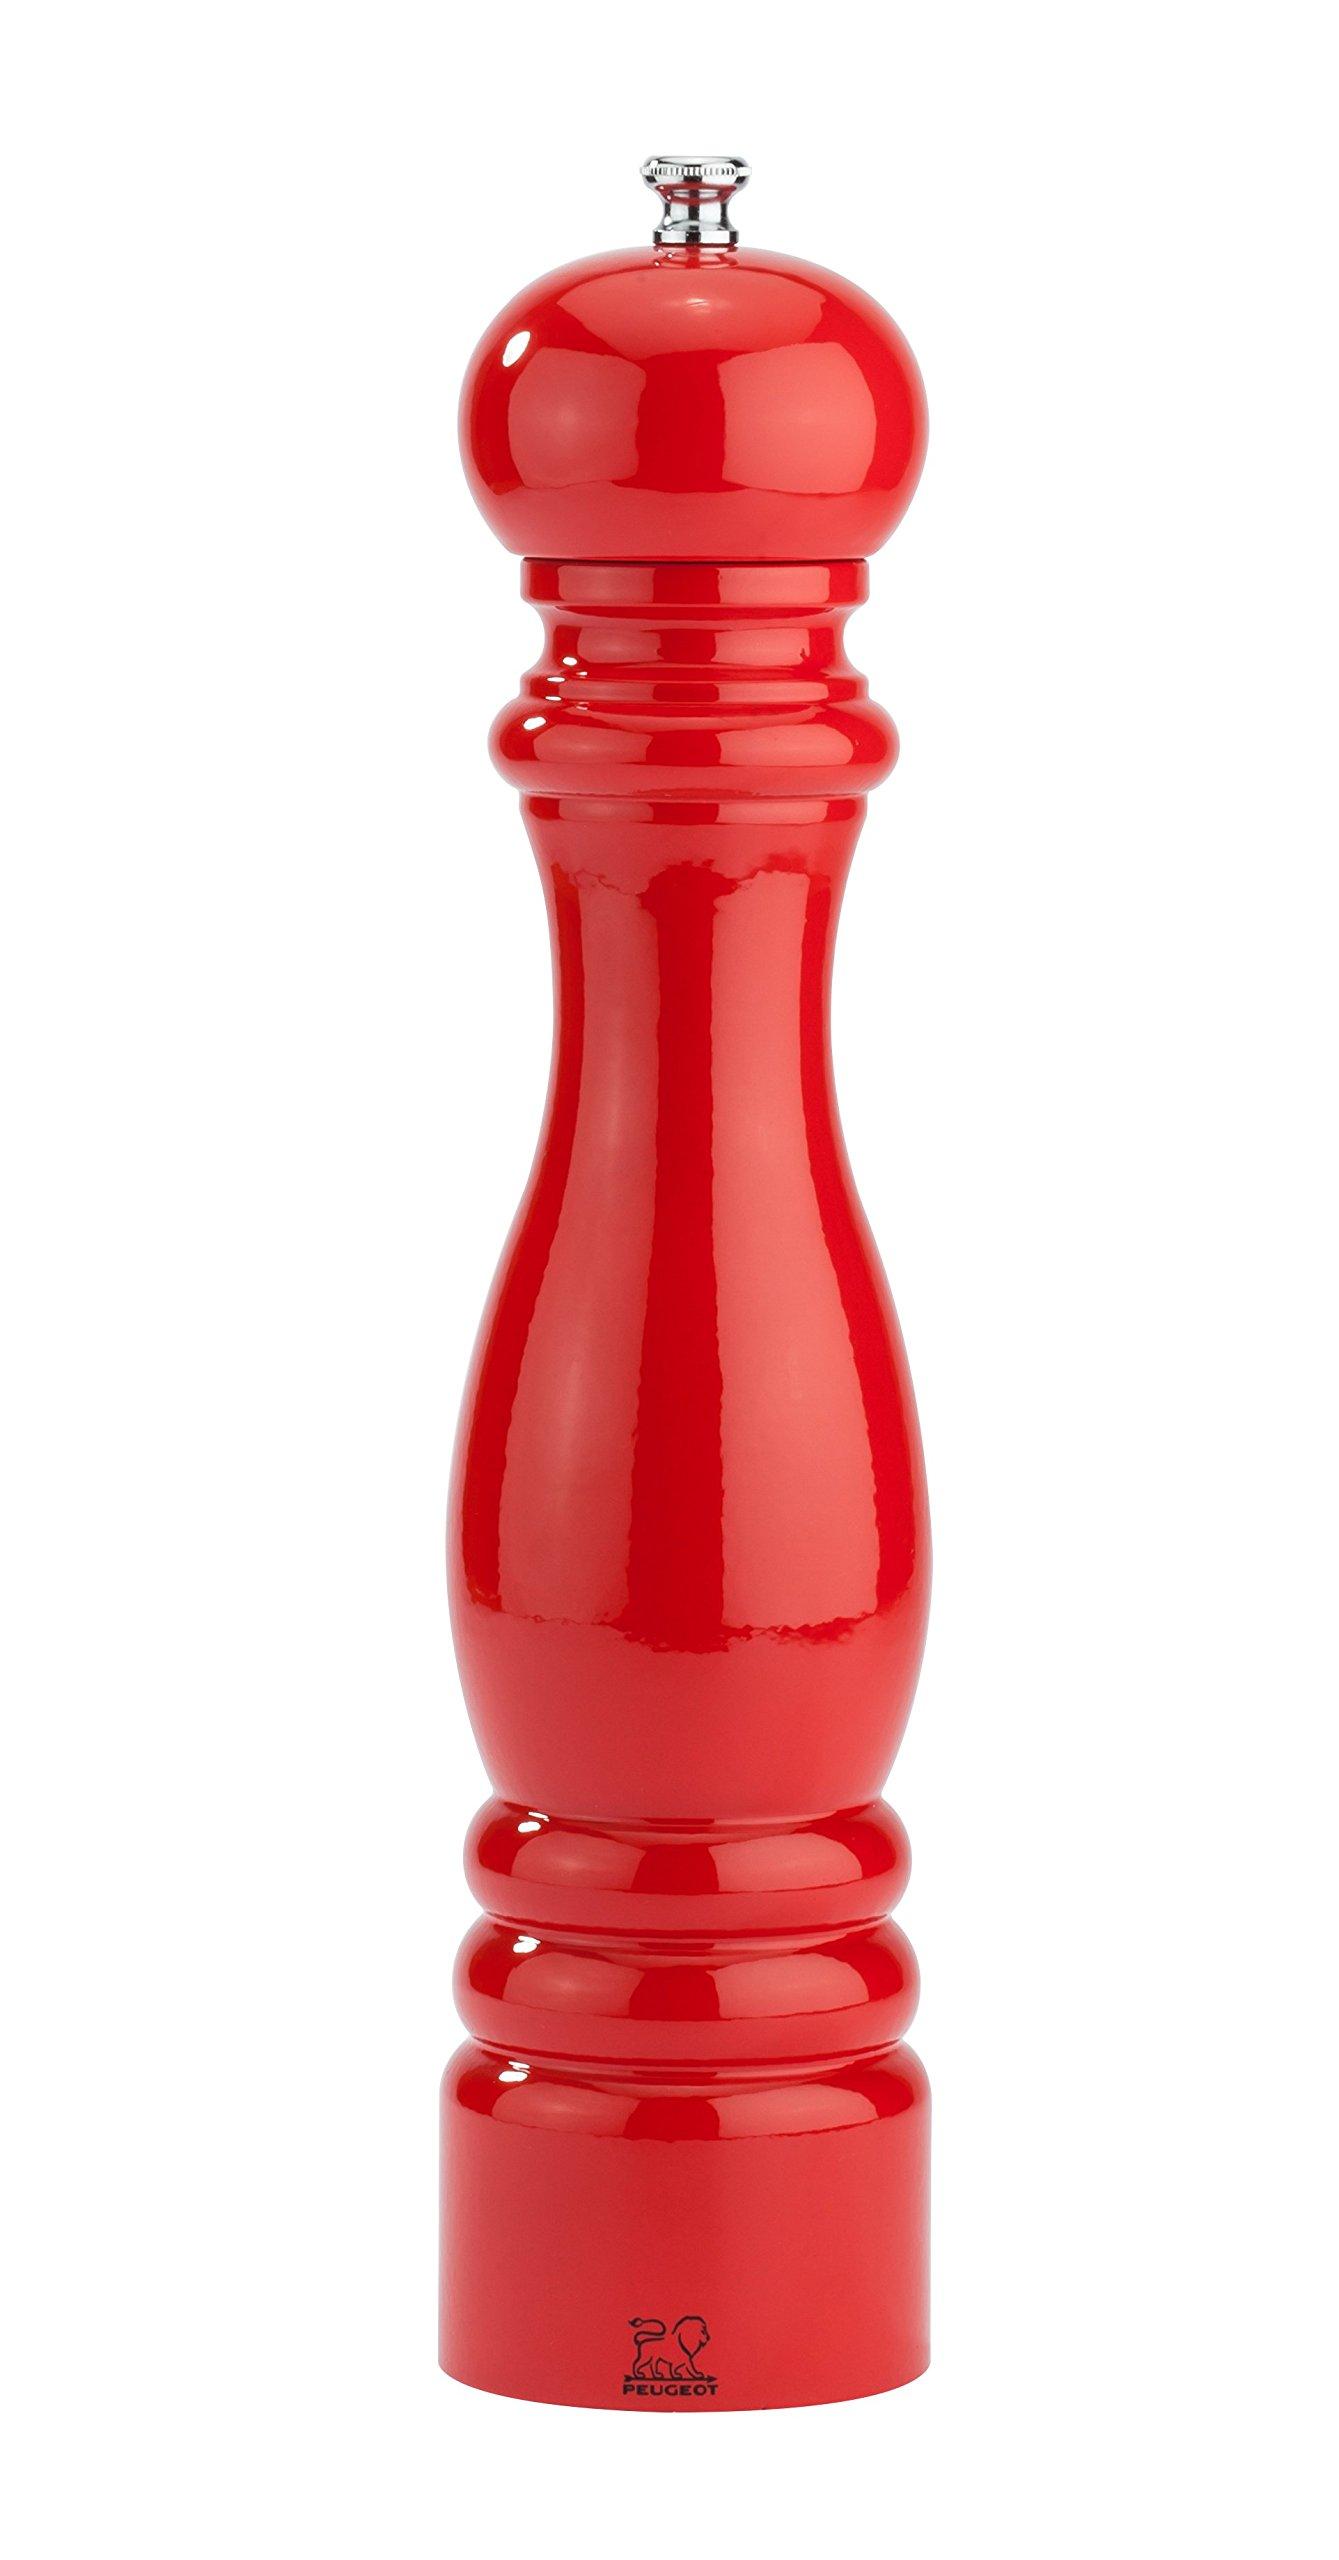 Peugeot 31077 Paris Classic Salt Mill, 12'', Poppy Red